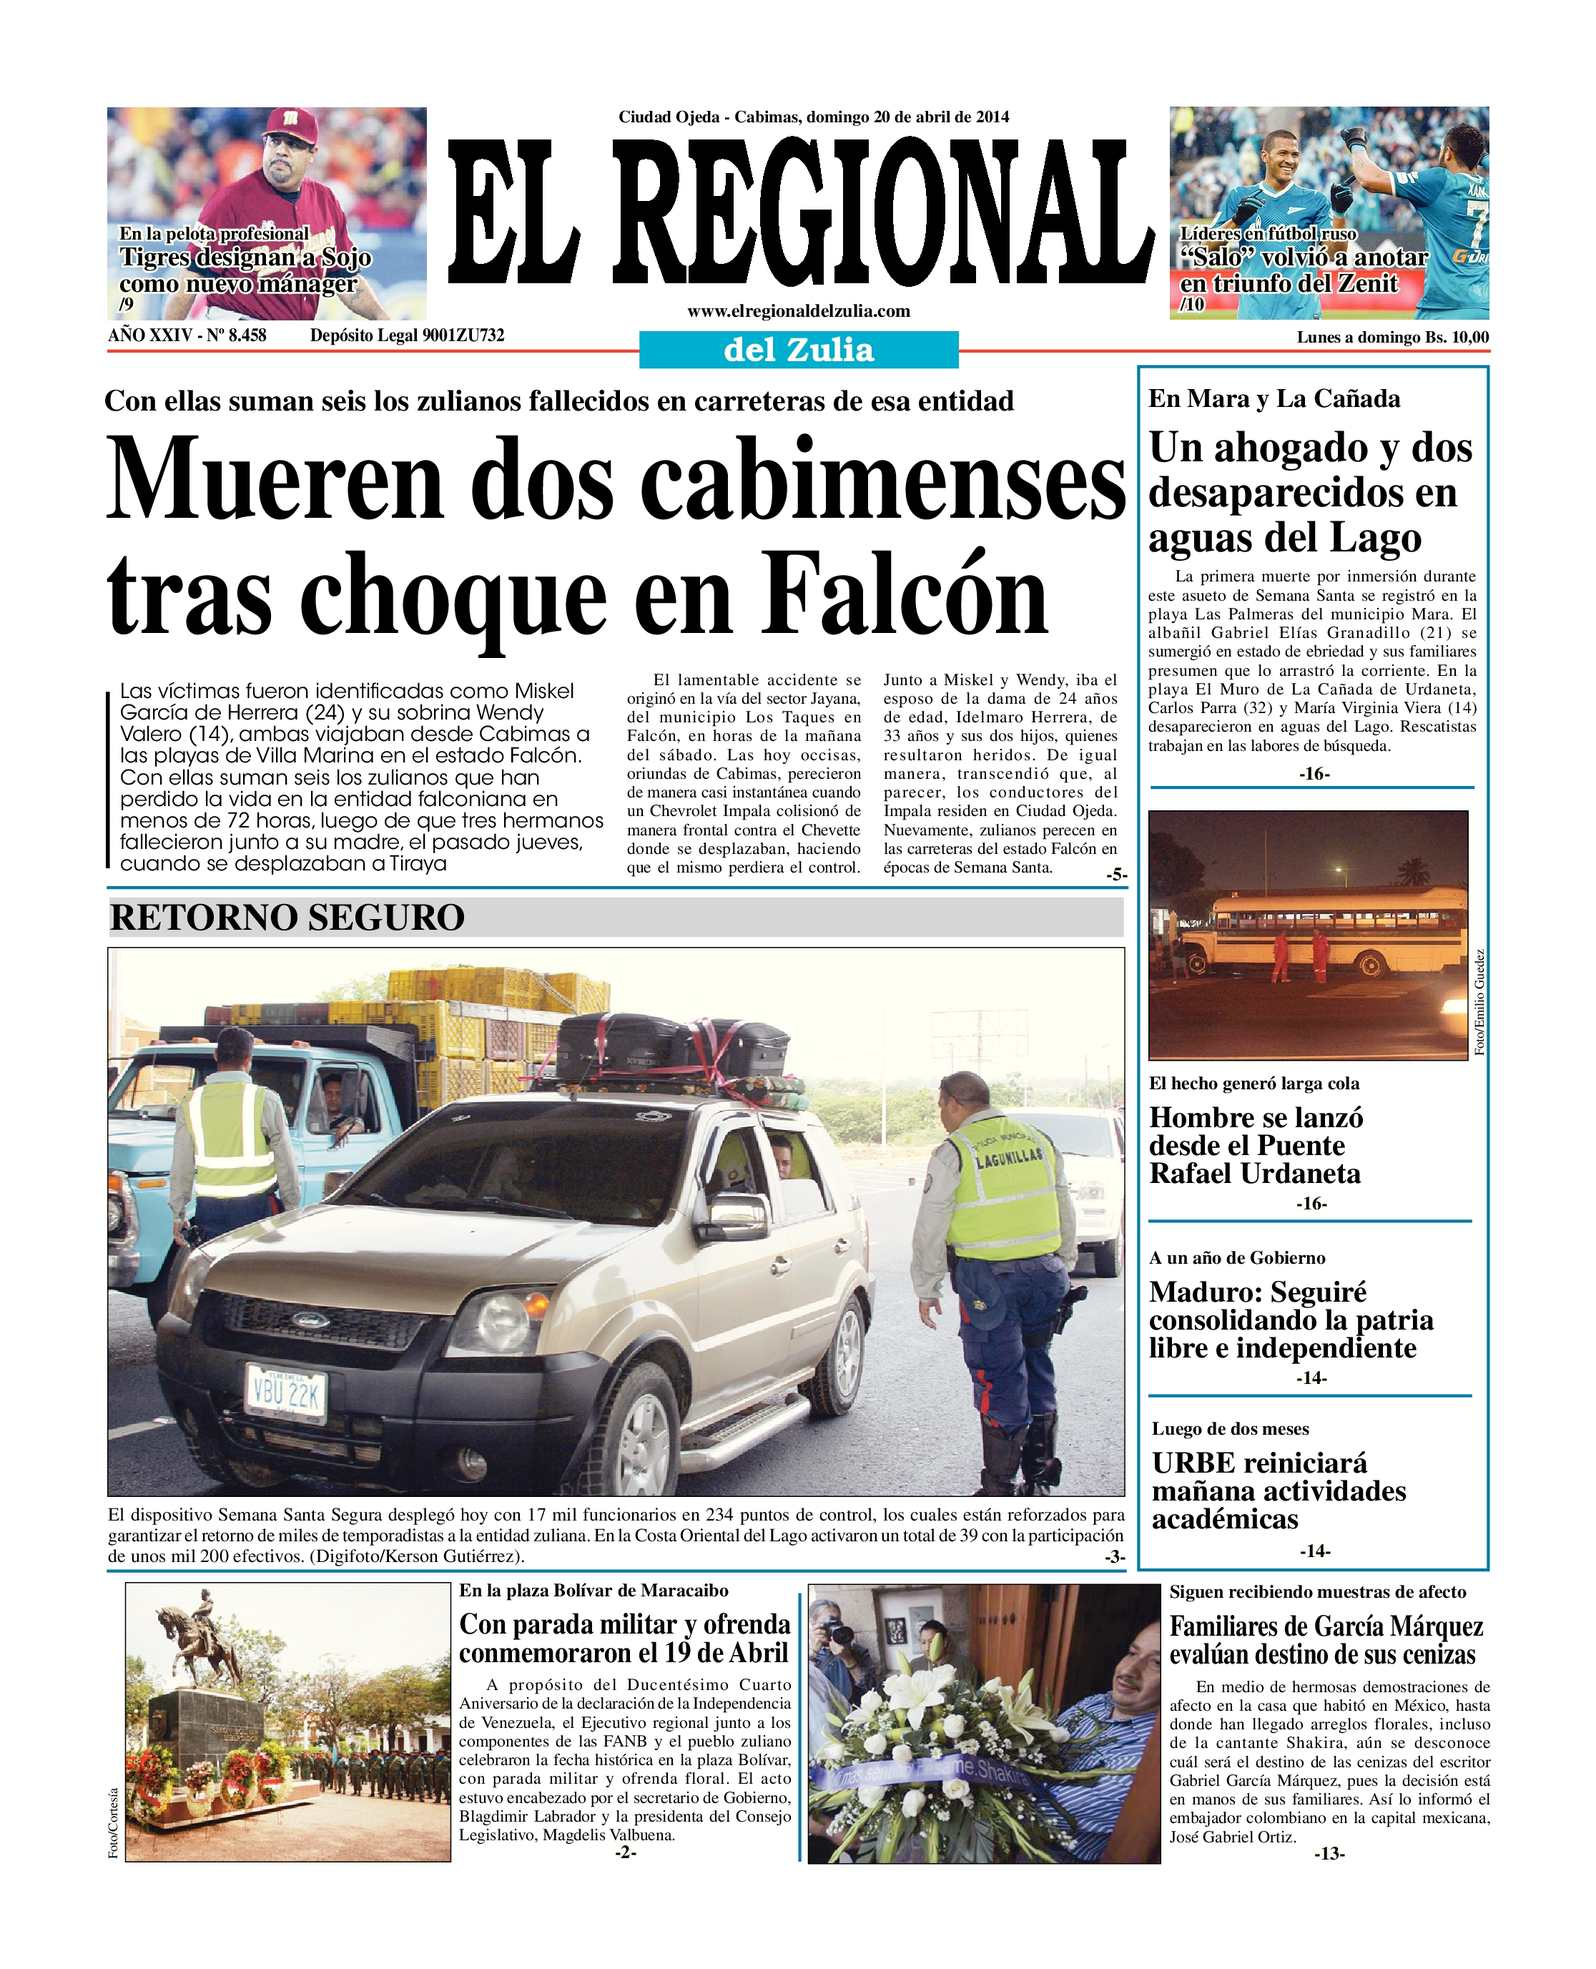 Calaméo - El Regional del Zulia 20-04-2014